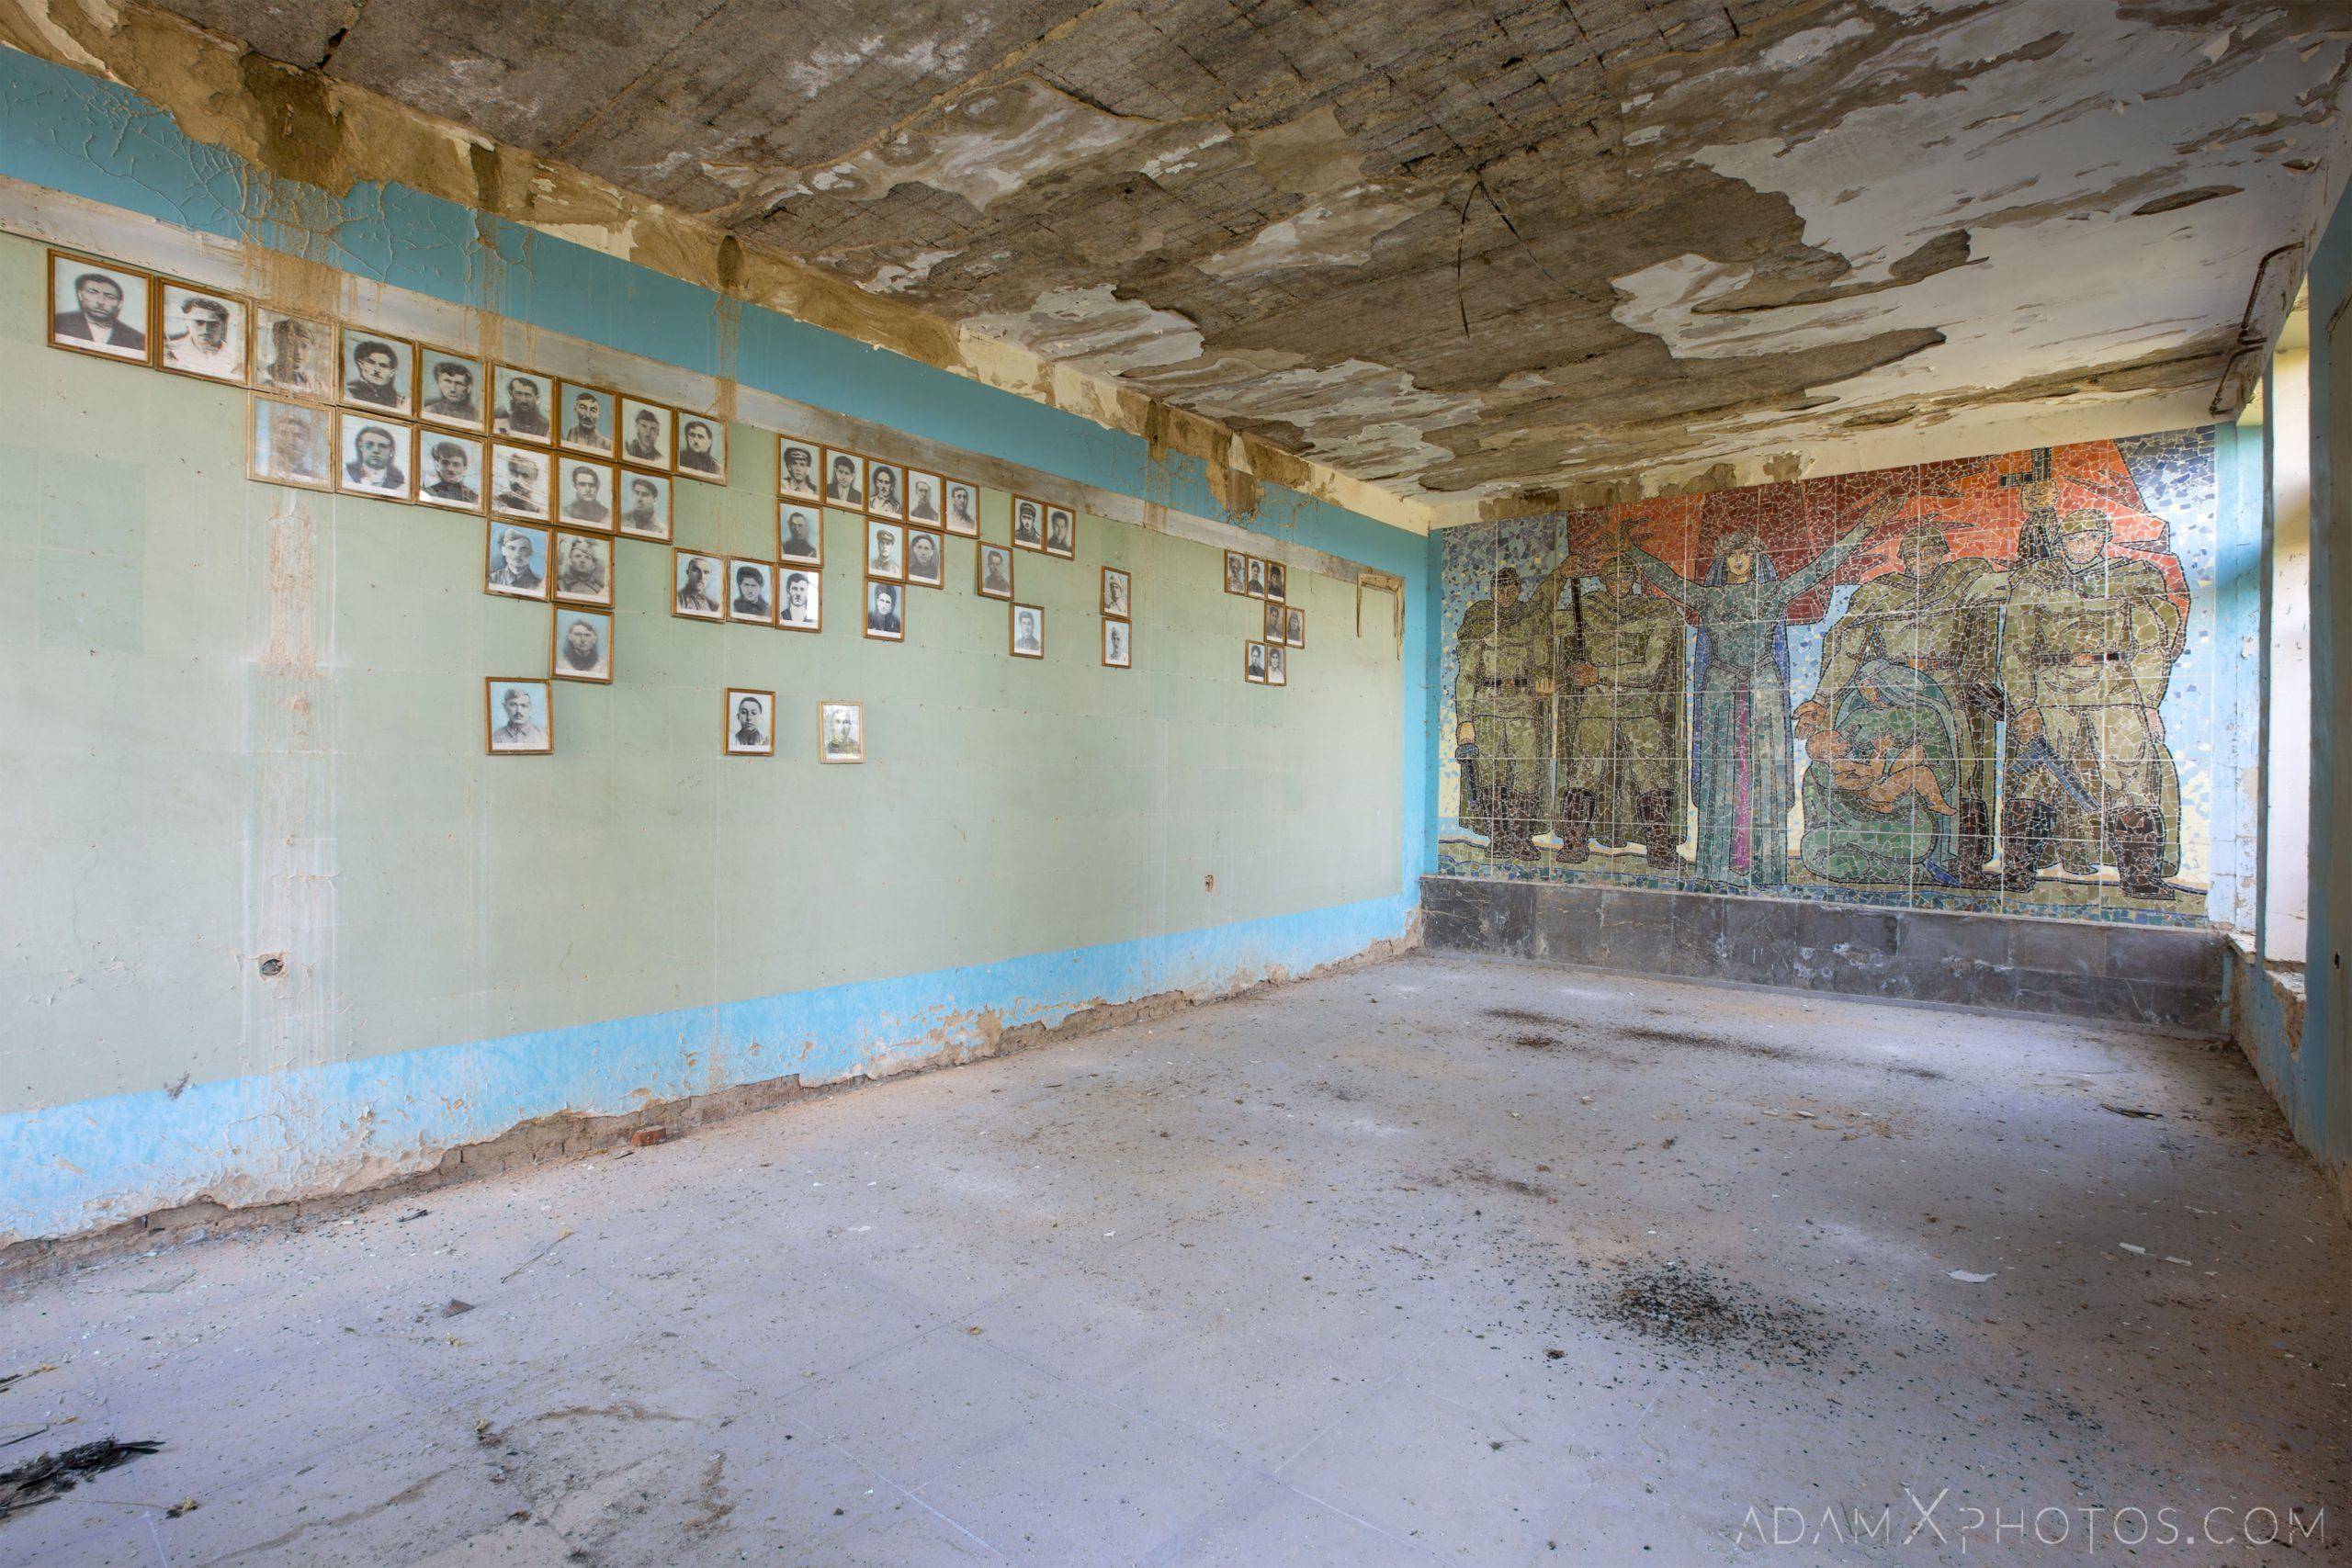 World War ii 2 memorial mural empty abandoned rural Soviet era Georgia Adam X AdamXPhotos Urbex Urban Exploration 2018 2019 Abandoned Access History decay ruins lost forgotten derelict location creepy haunting eerie security